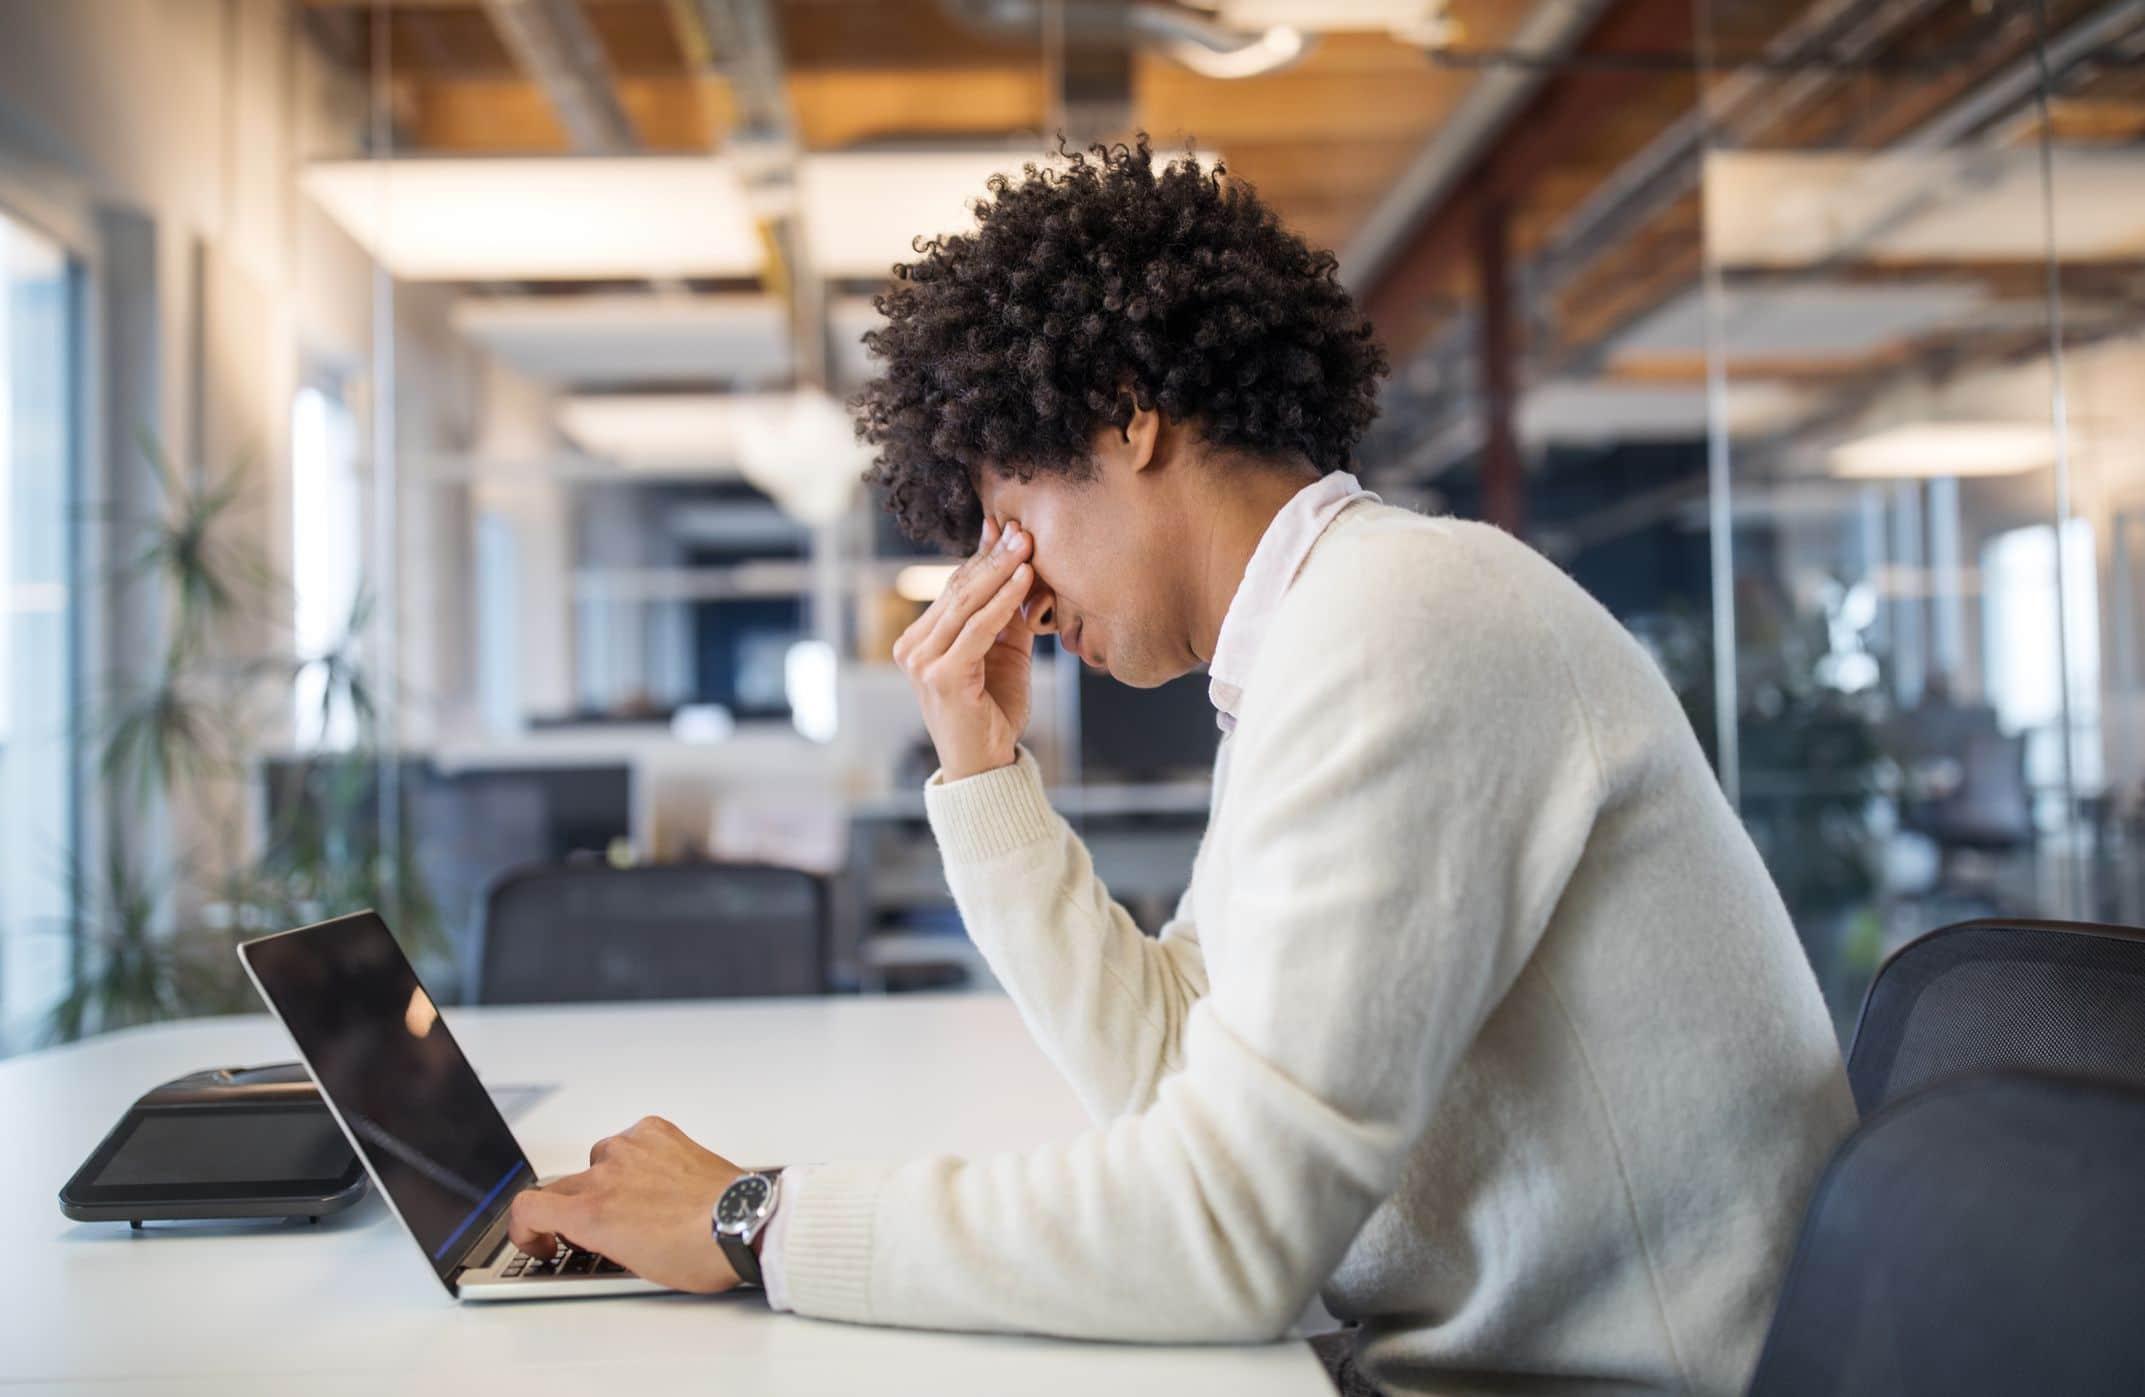 Saúde mental nas empresas